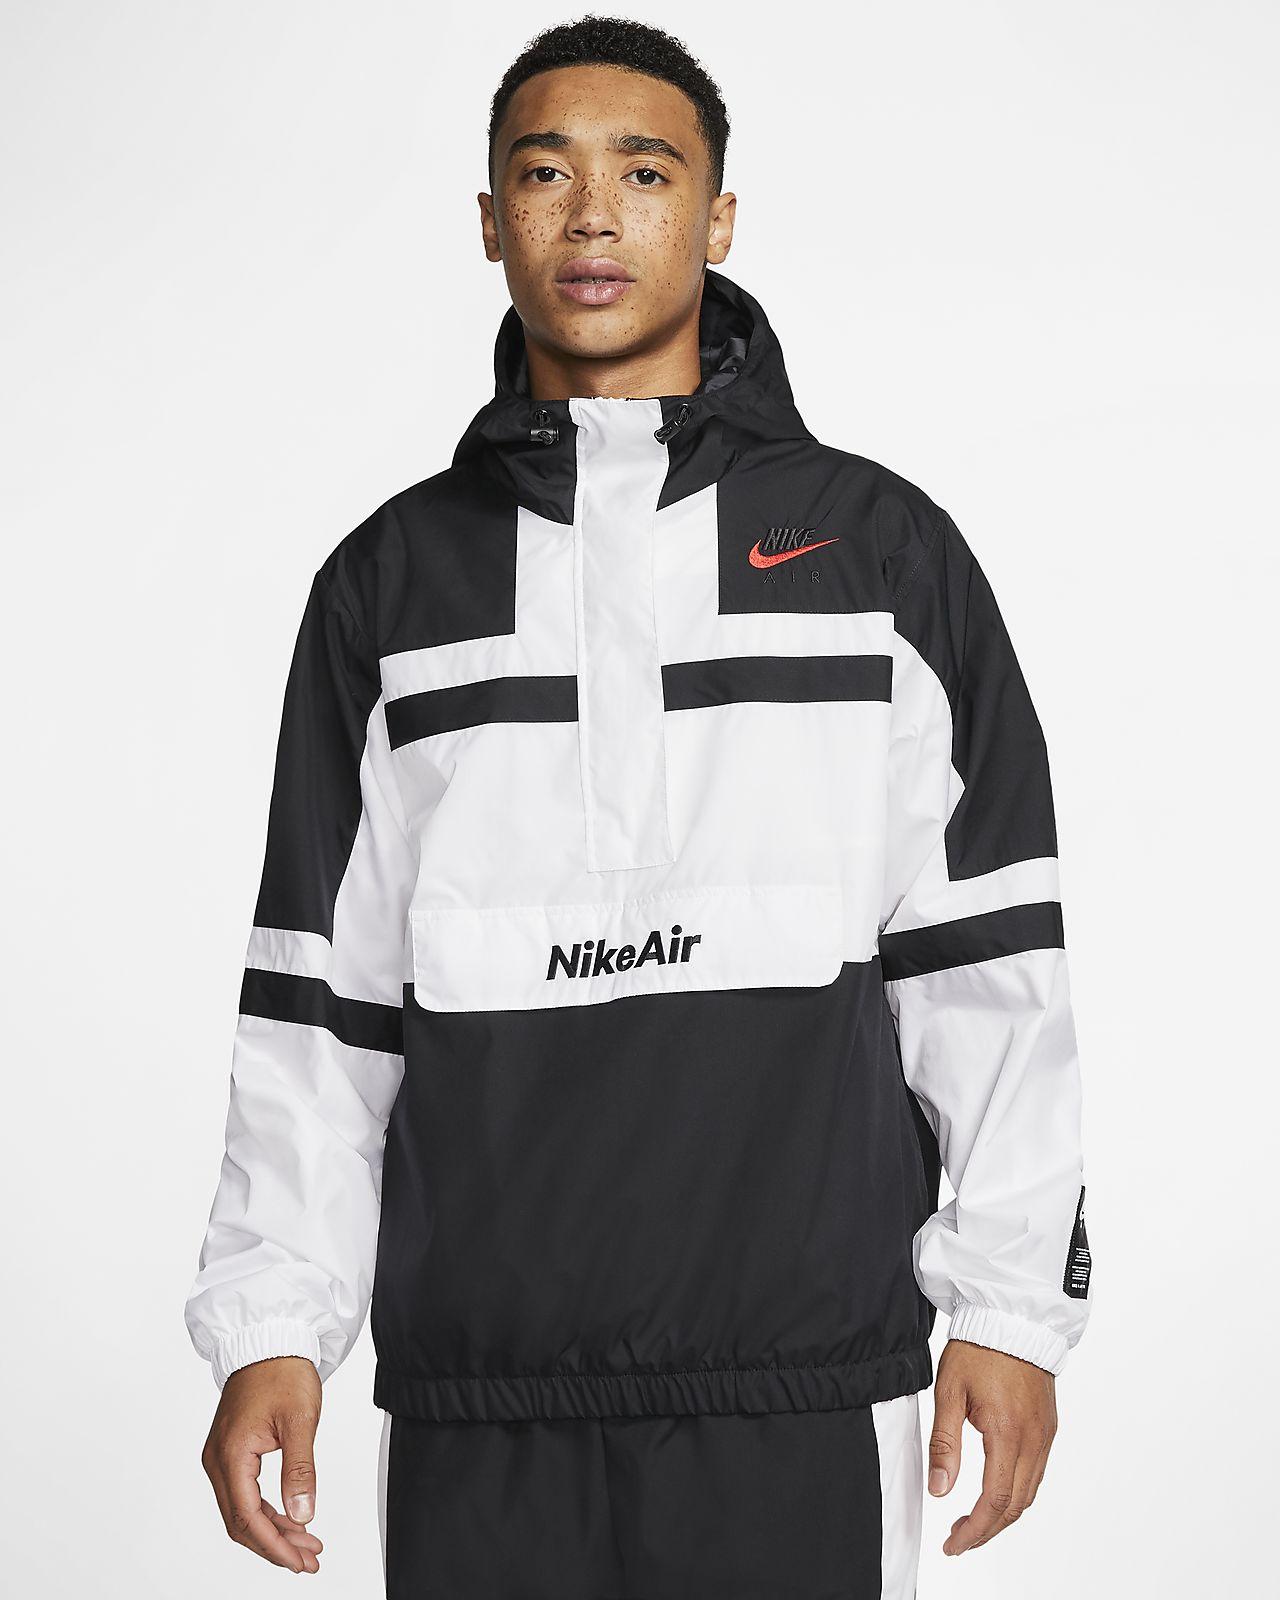 Męska kurtka z tkaniny Nike Air